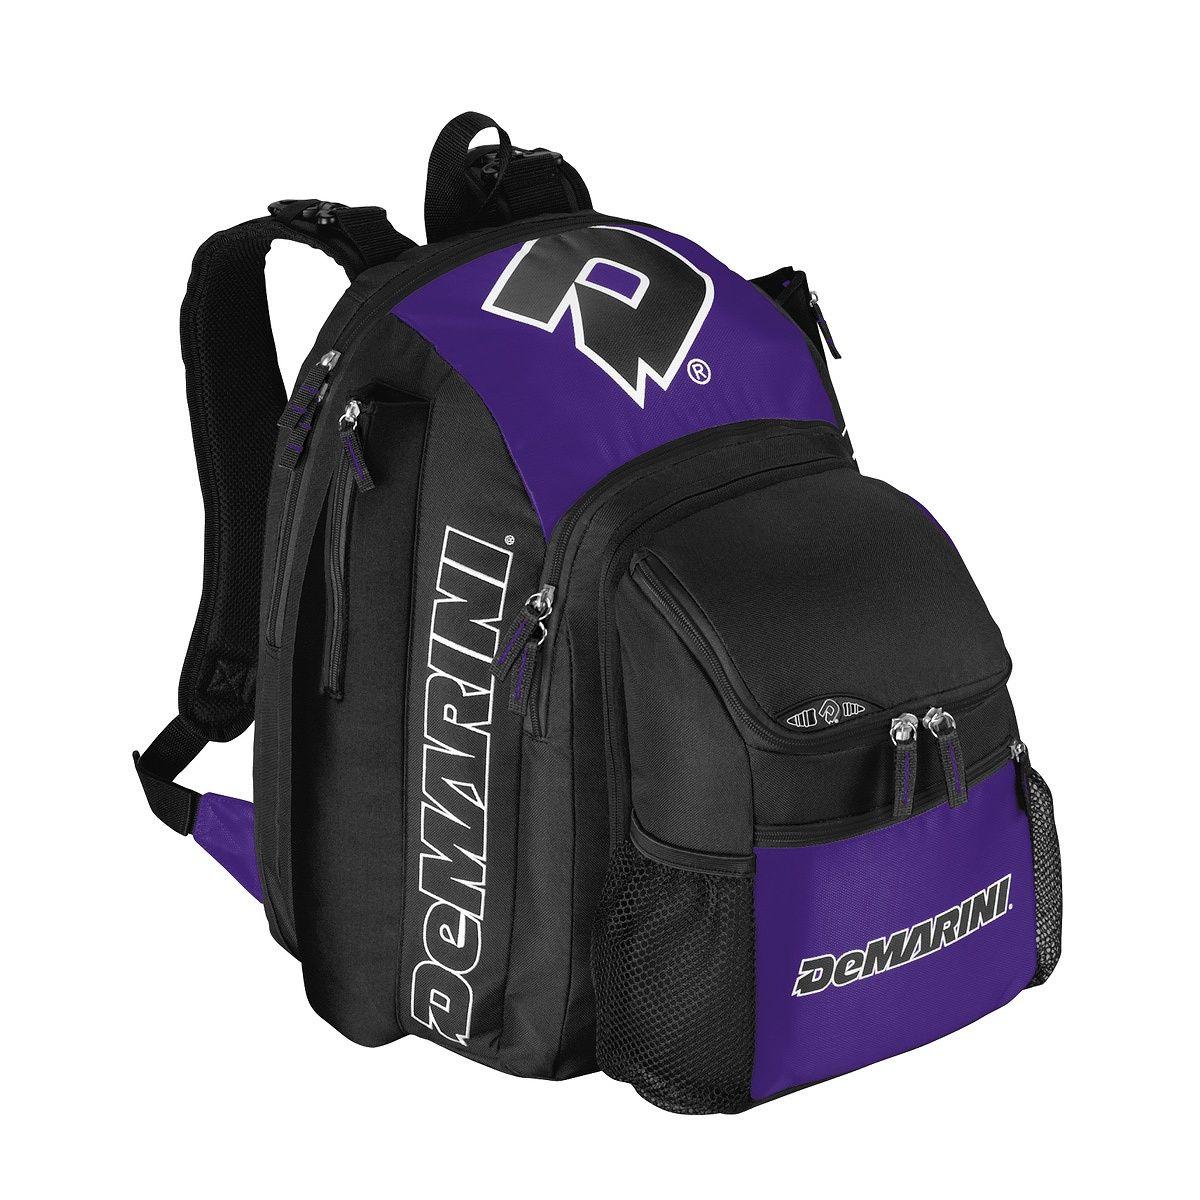 Demarini voodoo backpack baseball bat bags baseball